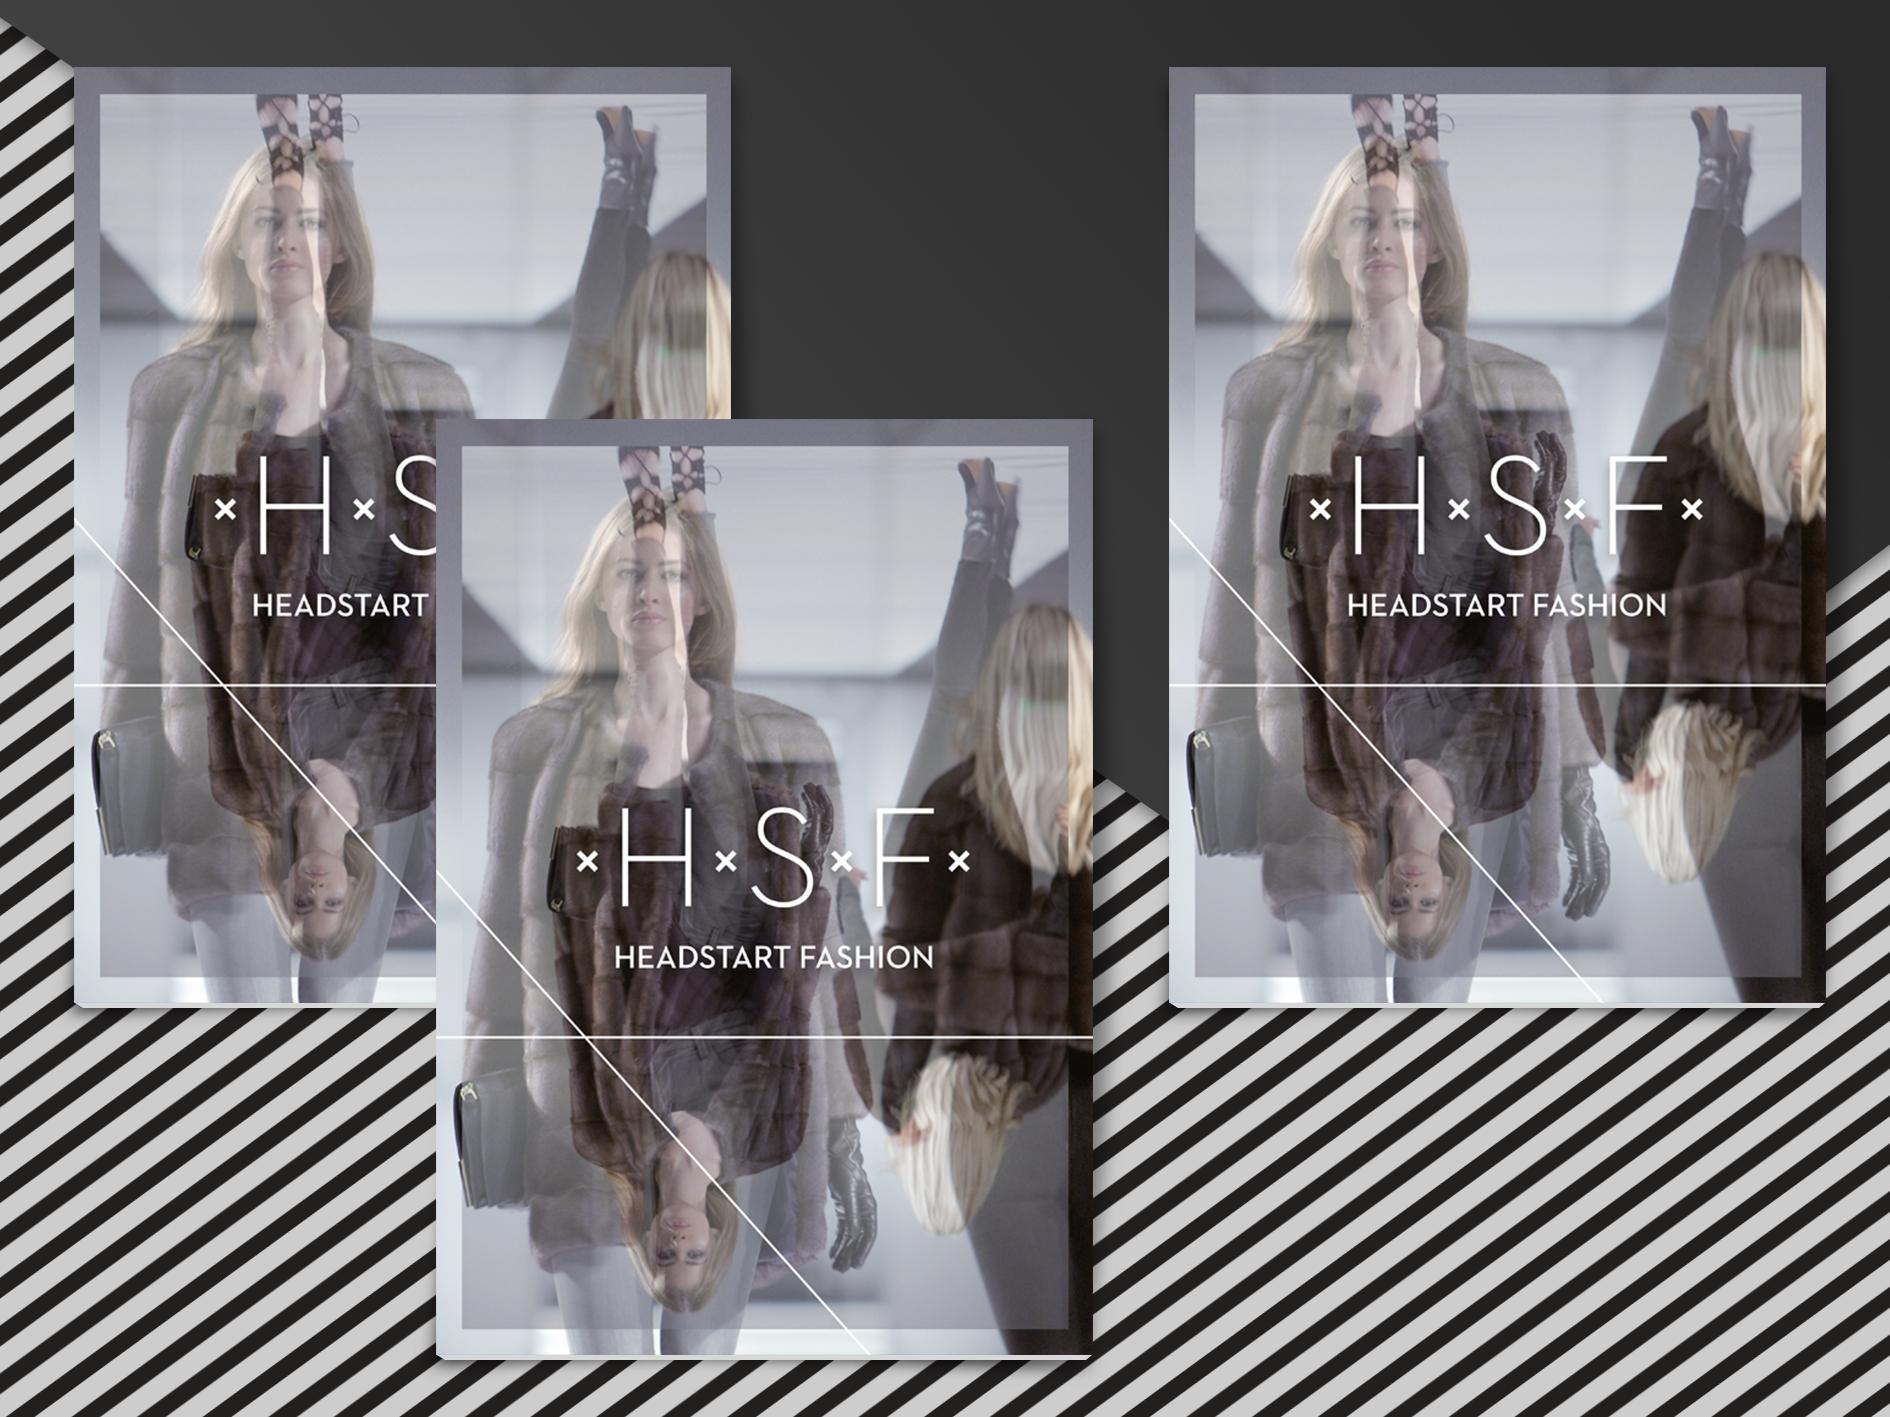 headstart_fashion_aarhus_magasin_grafiskdesign_krims_aarhus_maria_refsgaard_01